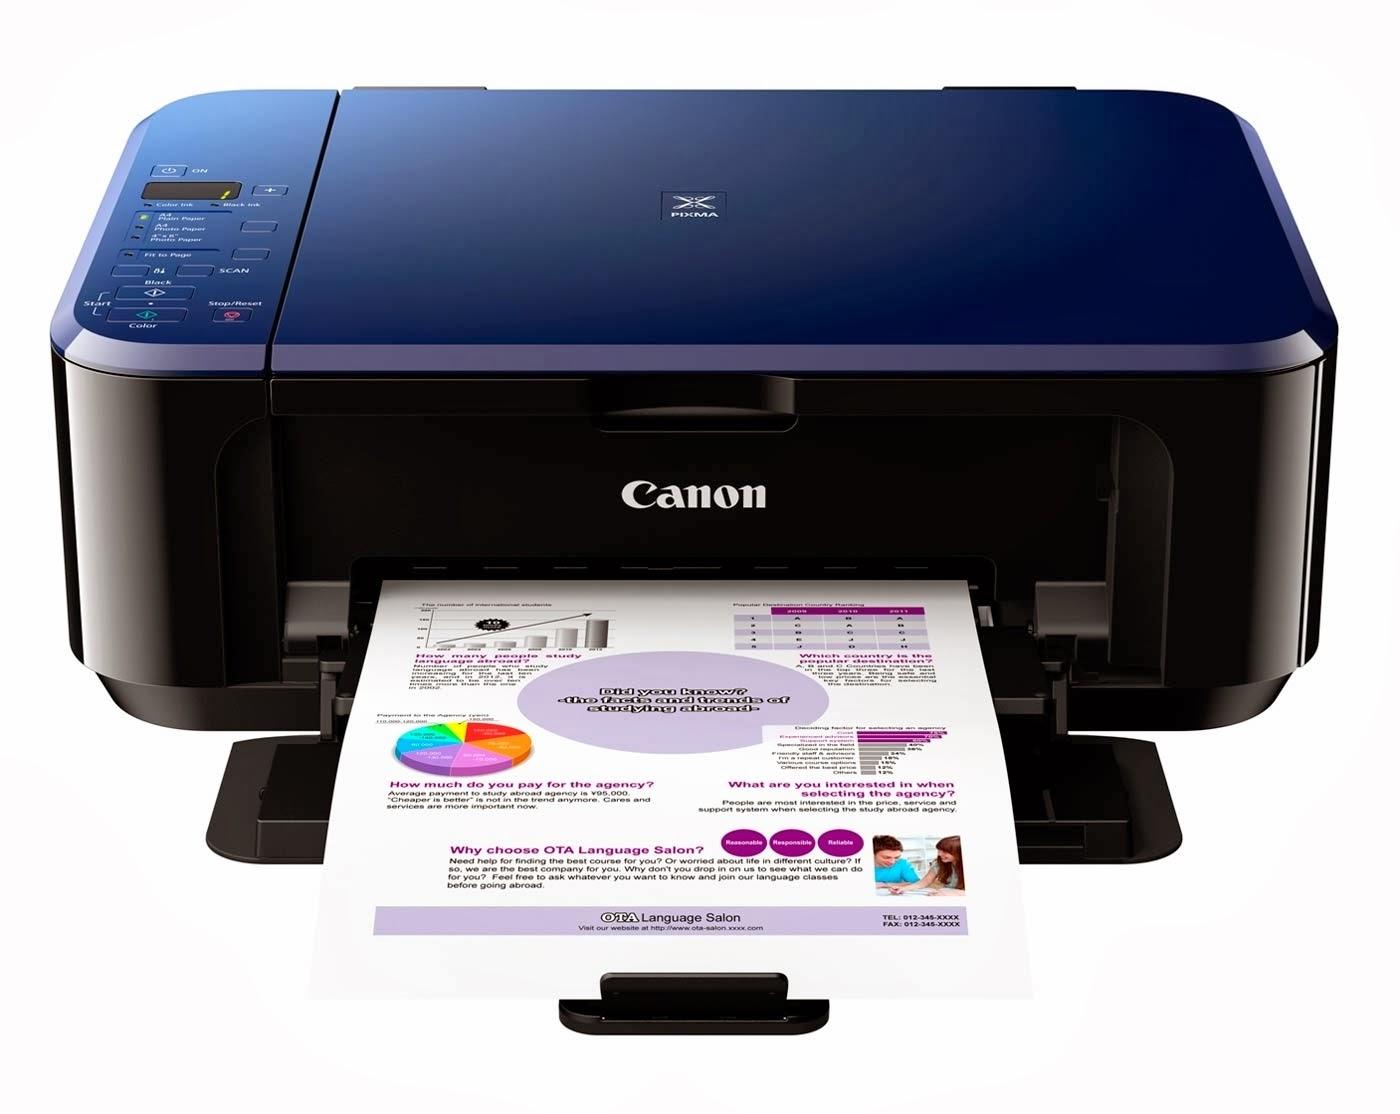 Canon PIXMA iP1200 - printer - color - ink-jet Specs